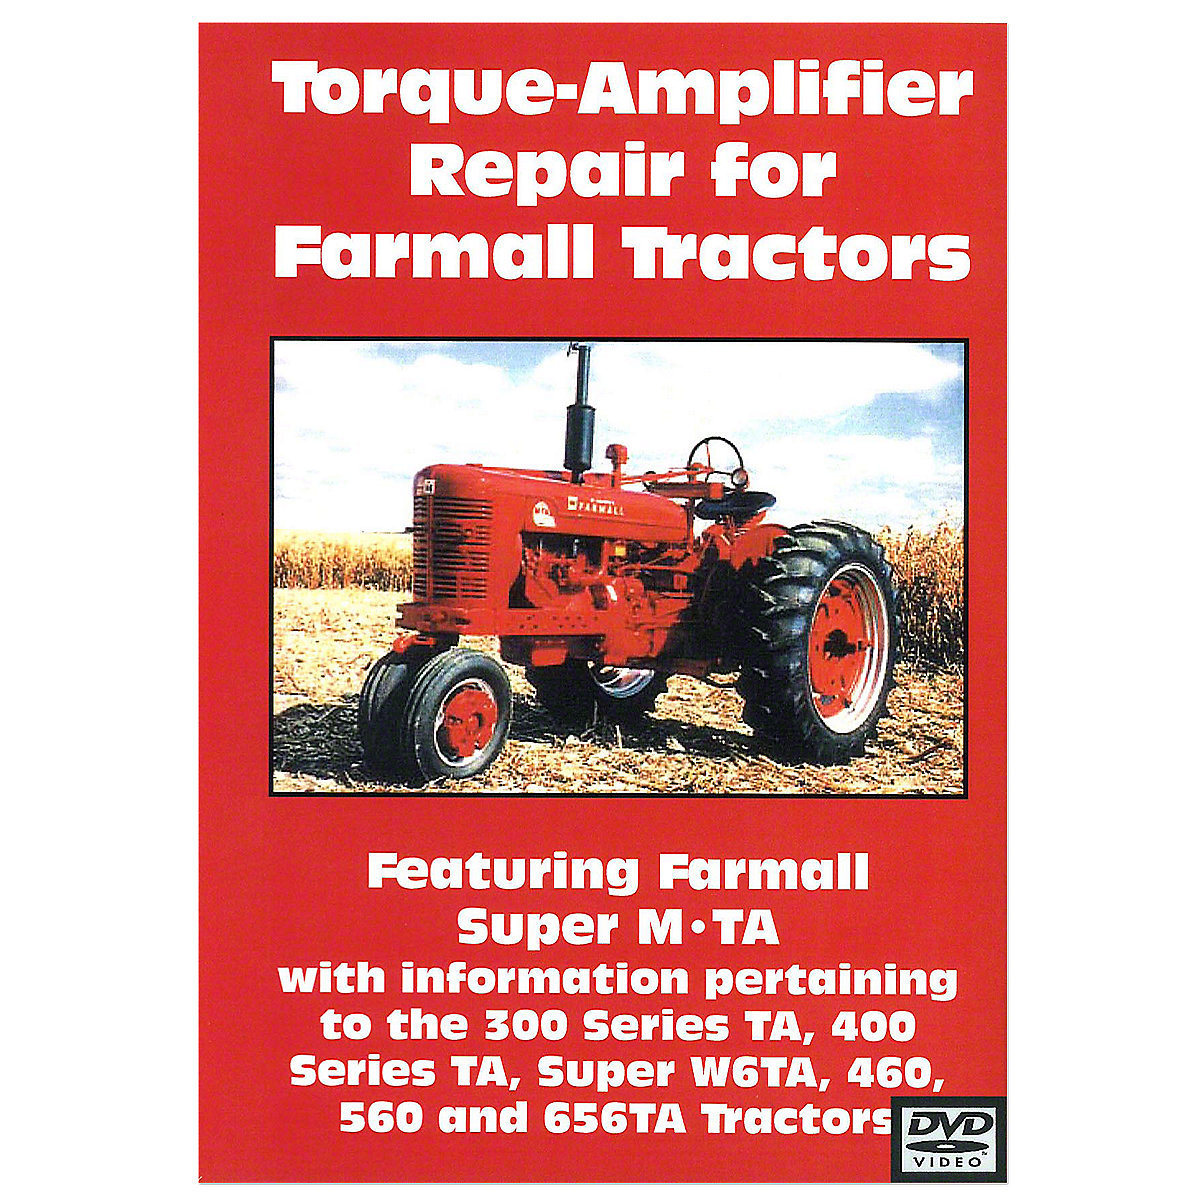 Rep102 Operators Manual Farmall 400 1954 International Wiring Diagram Torque Amplifier Repair Video Dvd